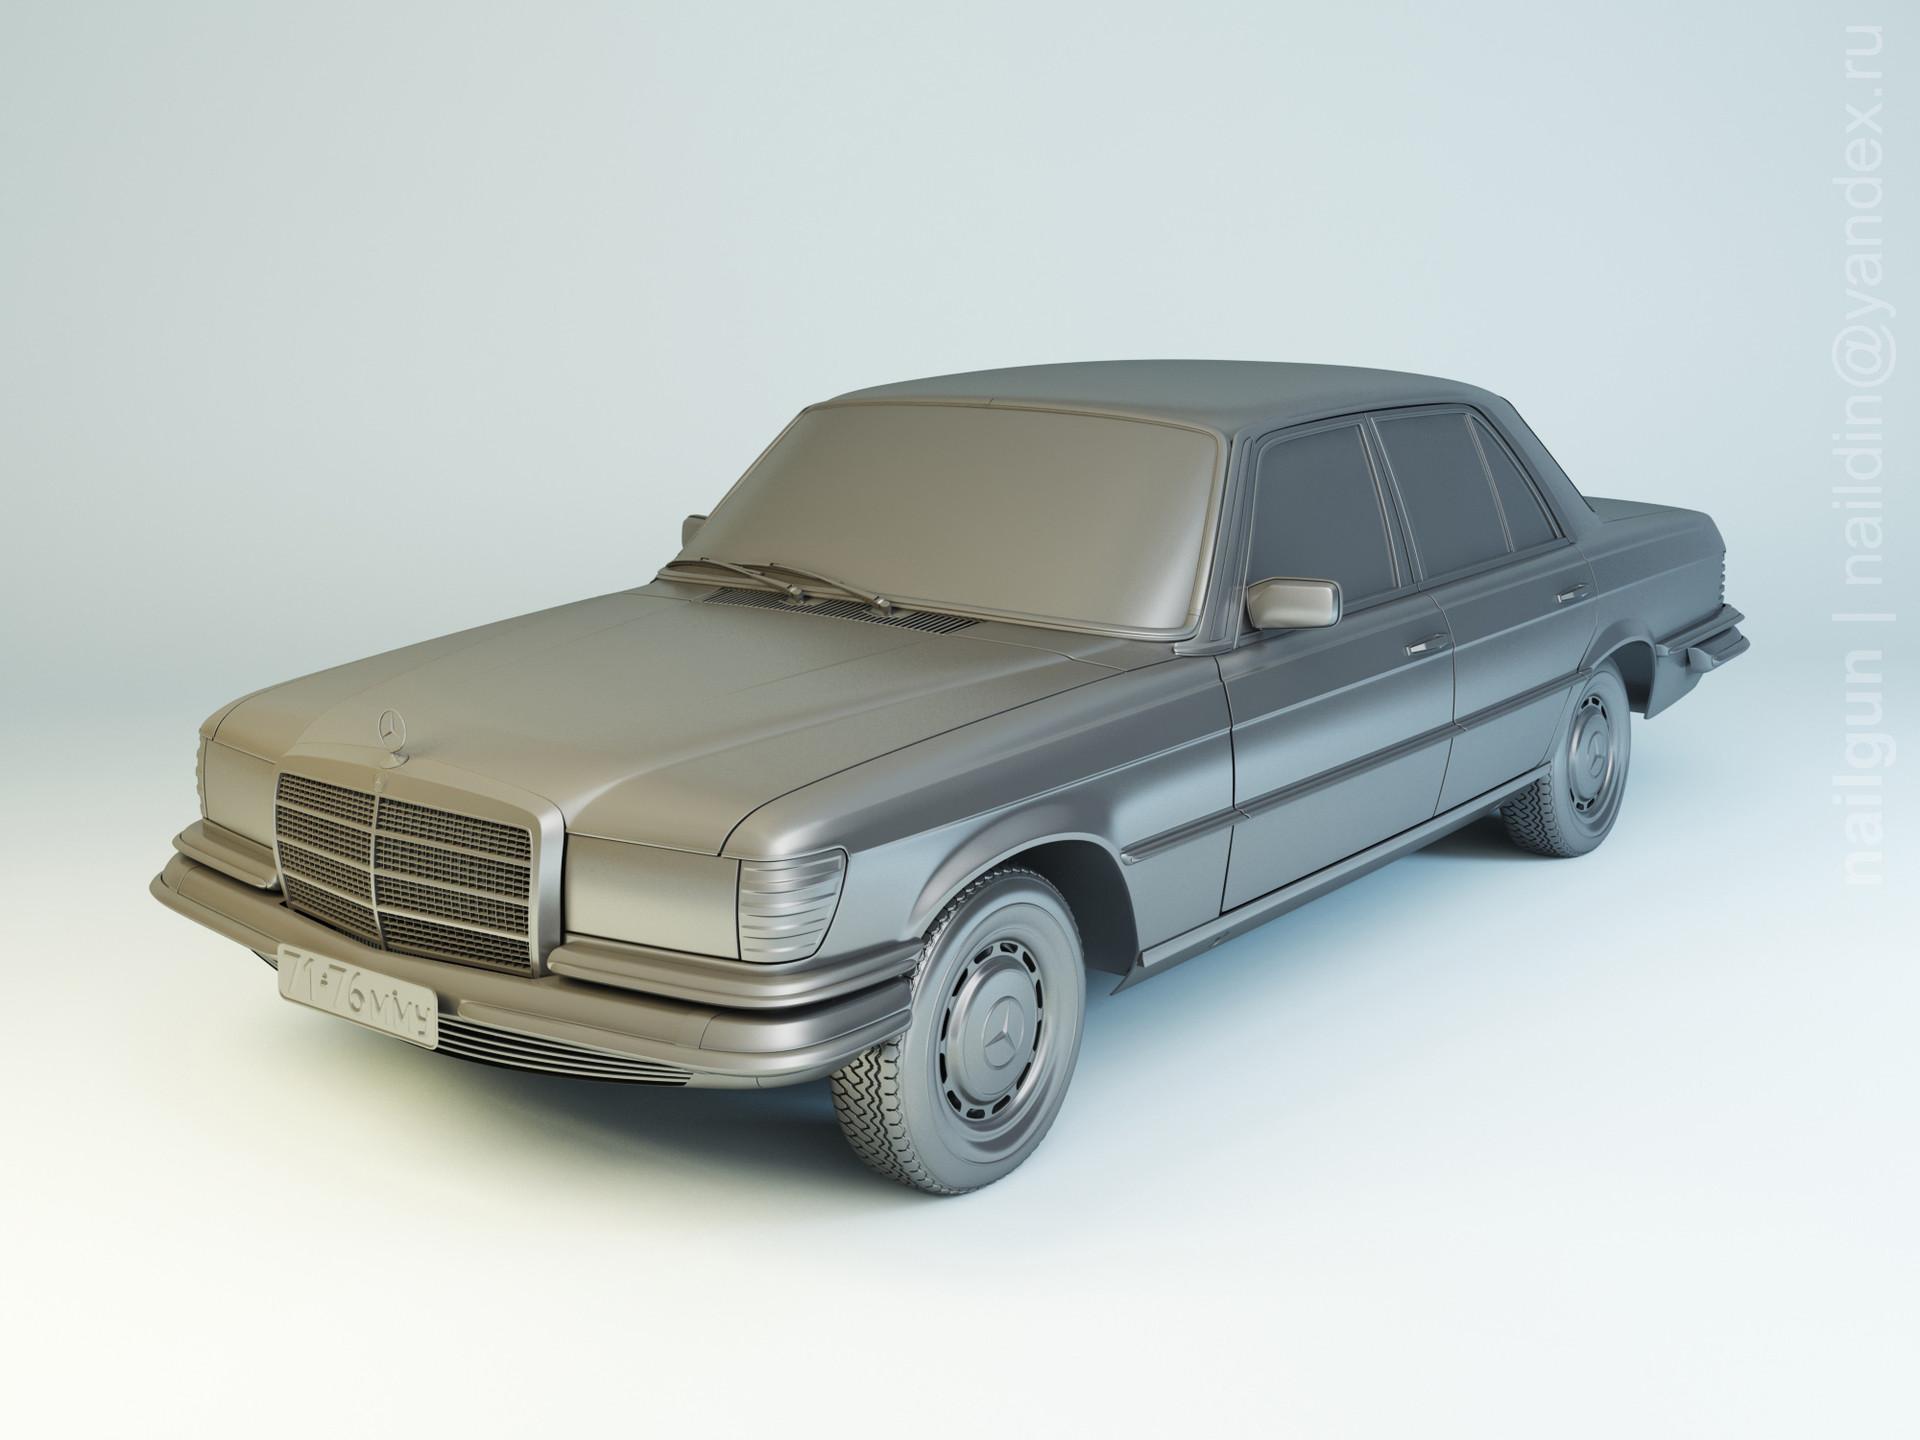 Nail khusnutdinov pwc 022 004 mercedes w116 modelling 0